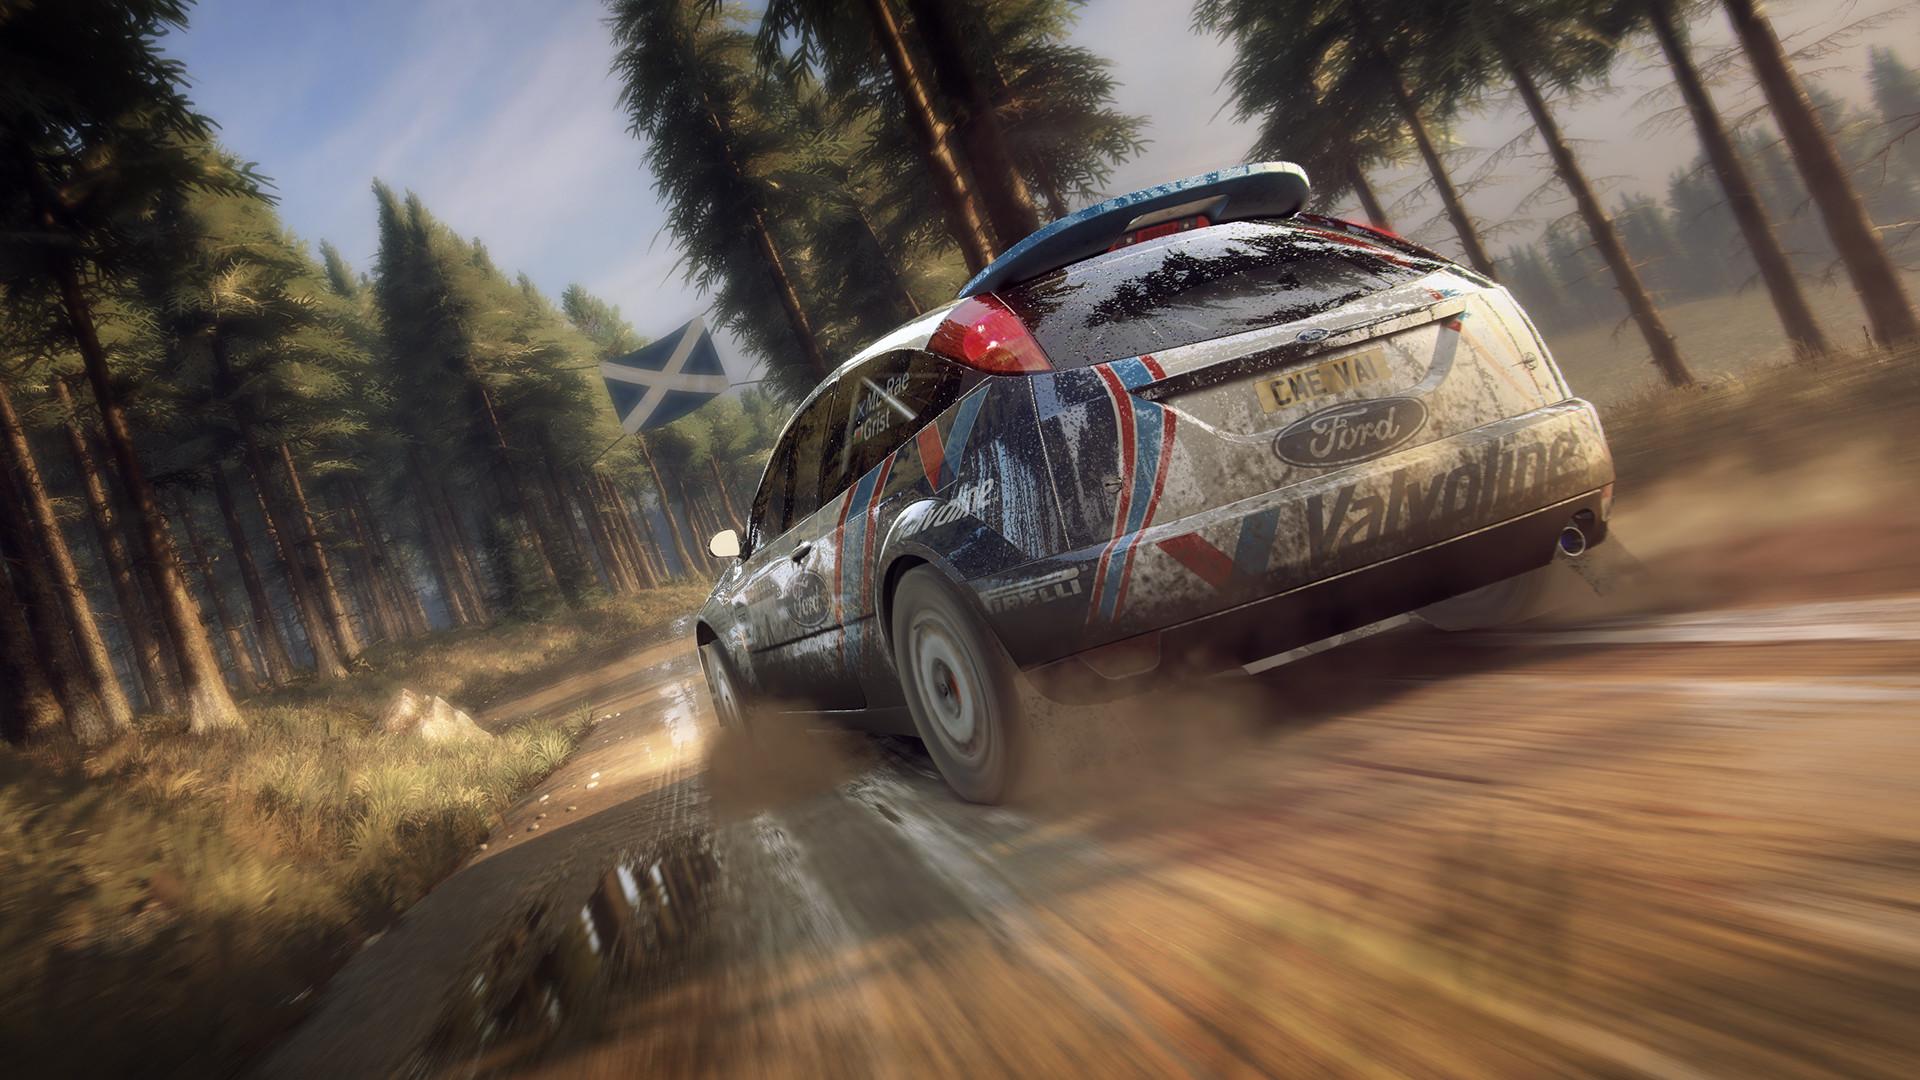 Codemasters has approved EA's $1.2 billion acquisition bid